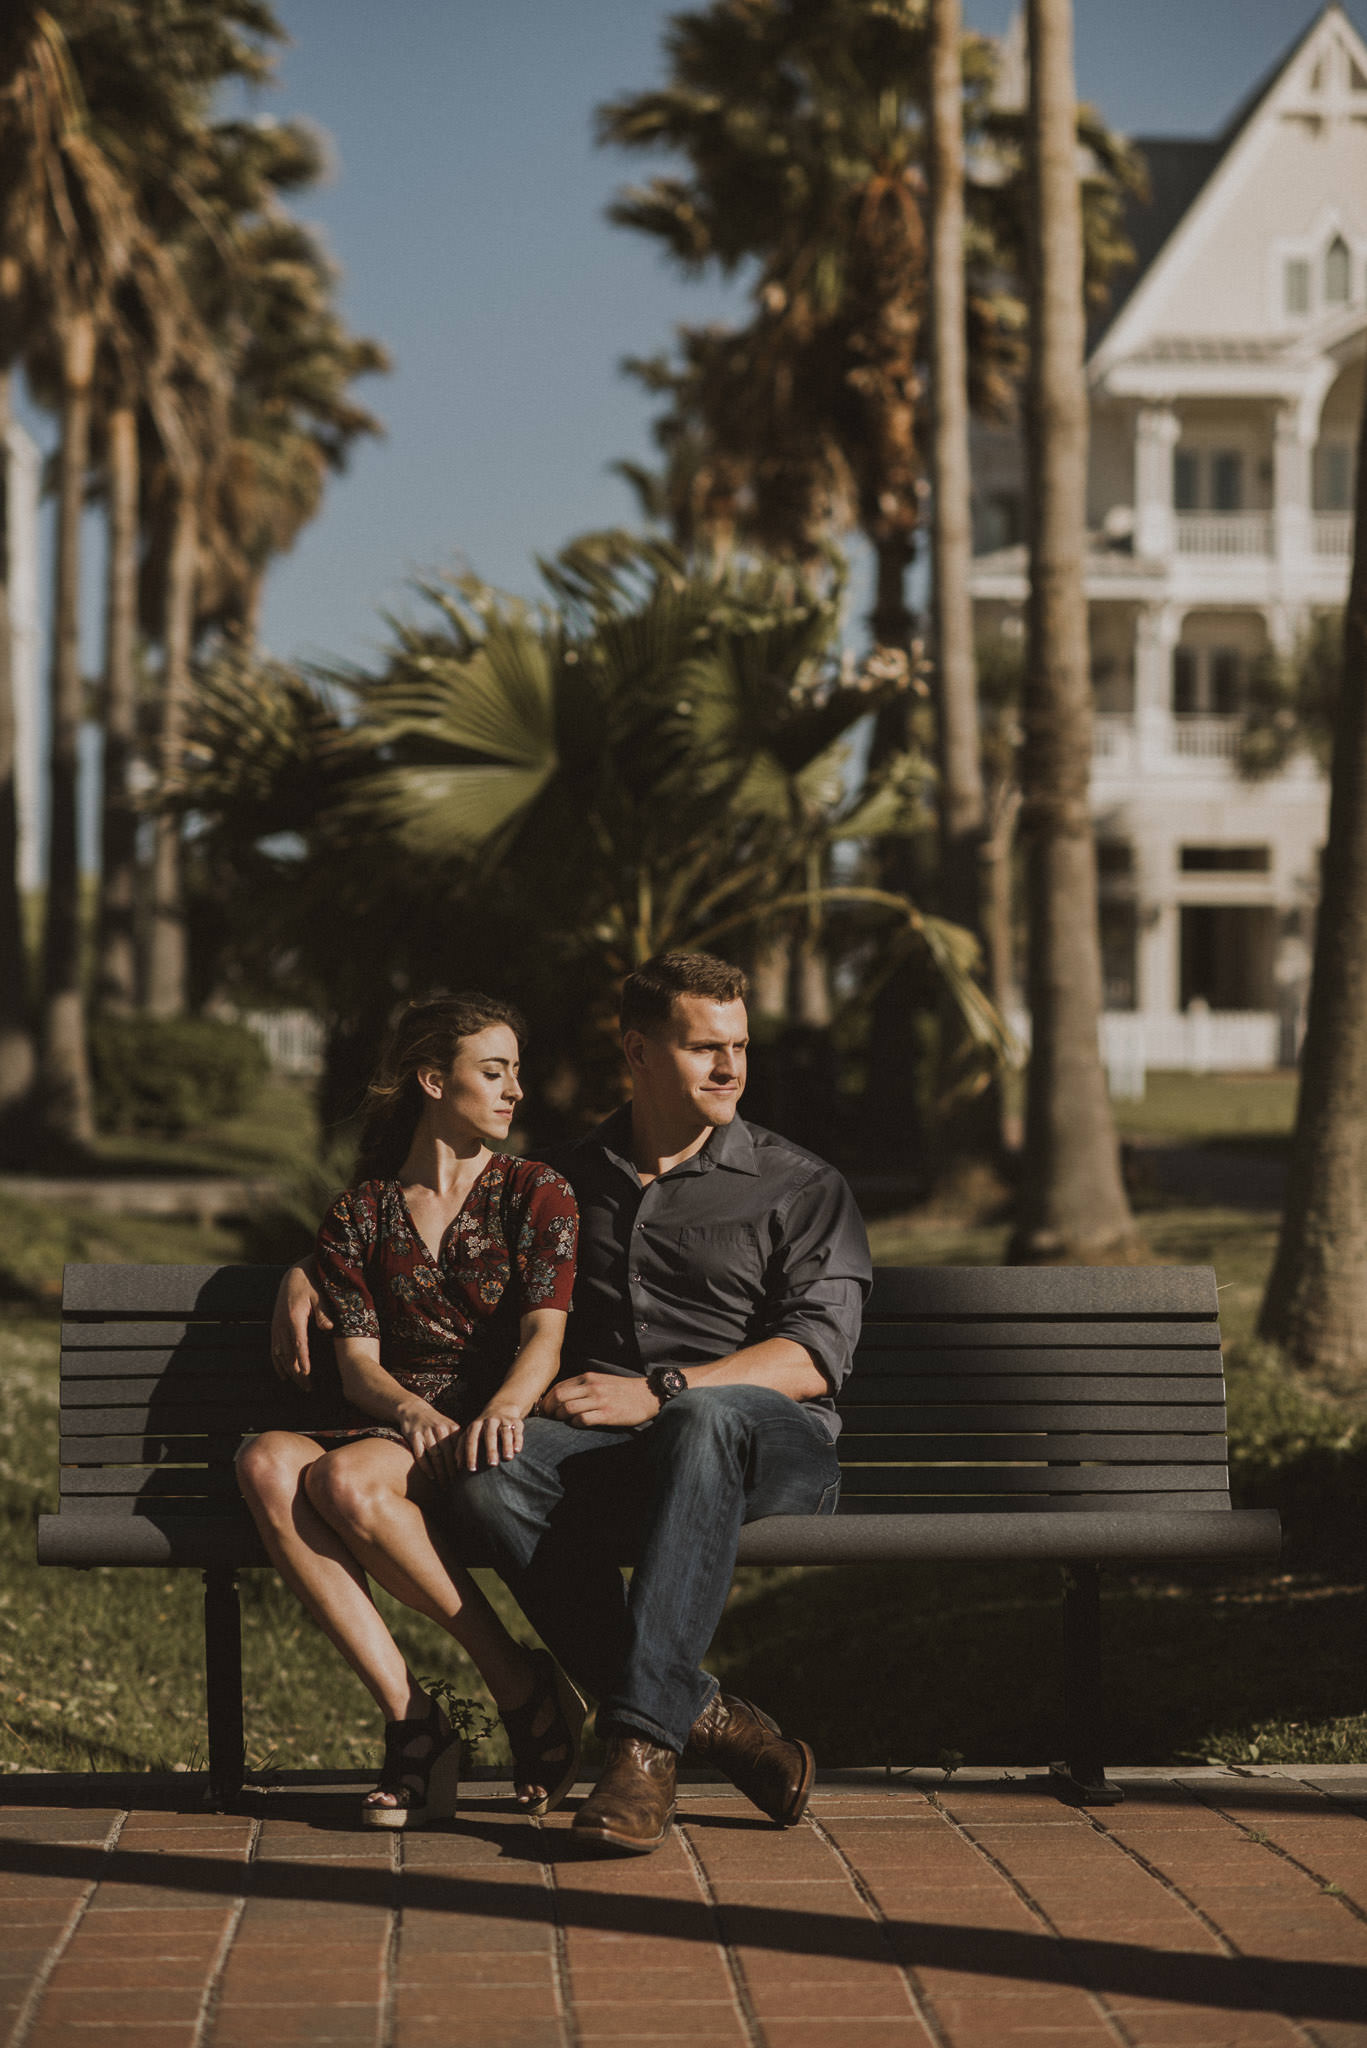 galveston-beach-engagement-photographer